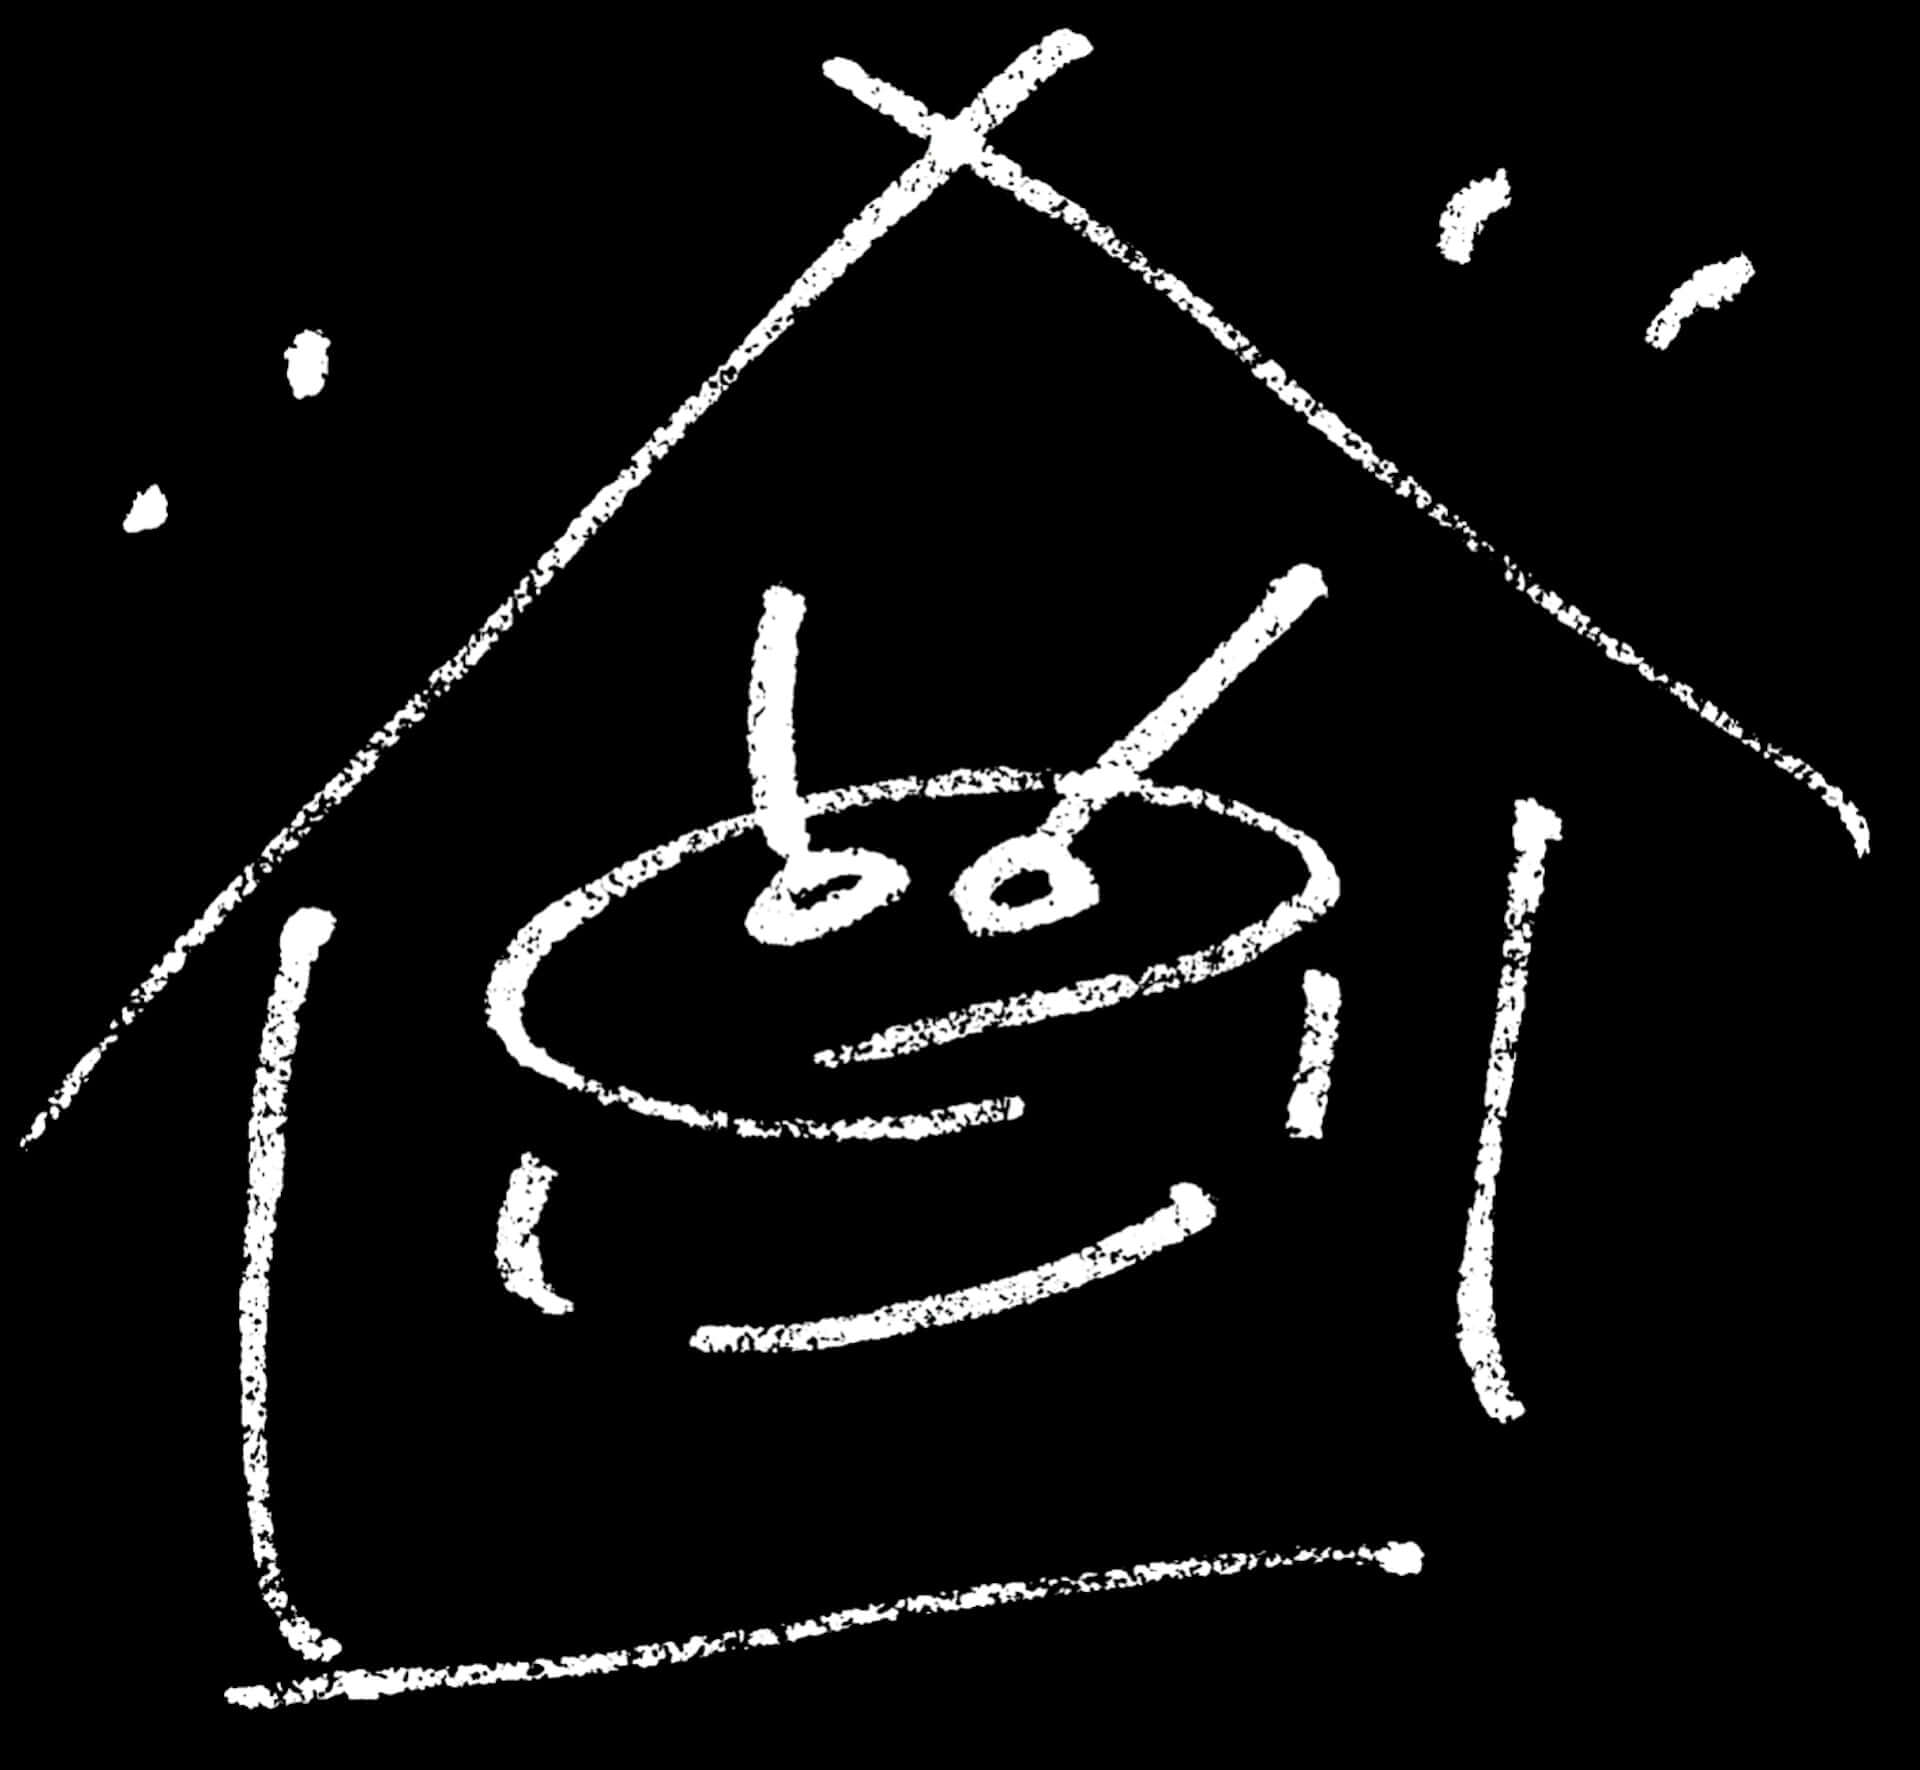 Yasei Collectiveのリーダー、松下マサナオが新たな動画企画「HIDEOUT SESSIONS」を始動!初回ゲストは類家心平 music200807_masanao-matsushita_1-1920x1770